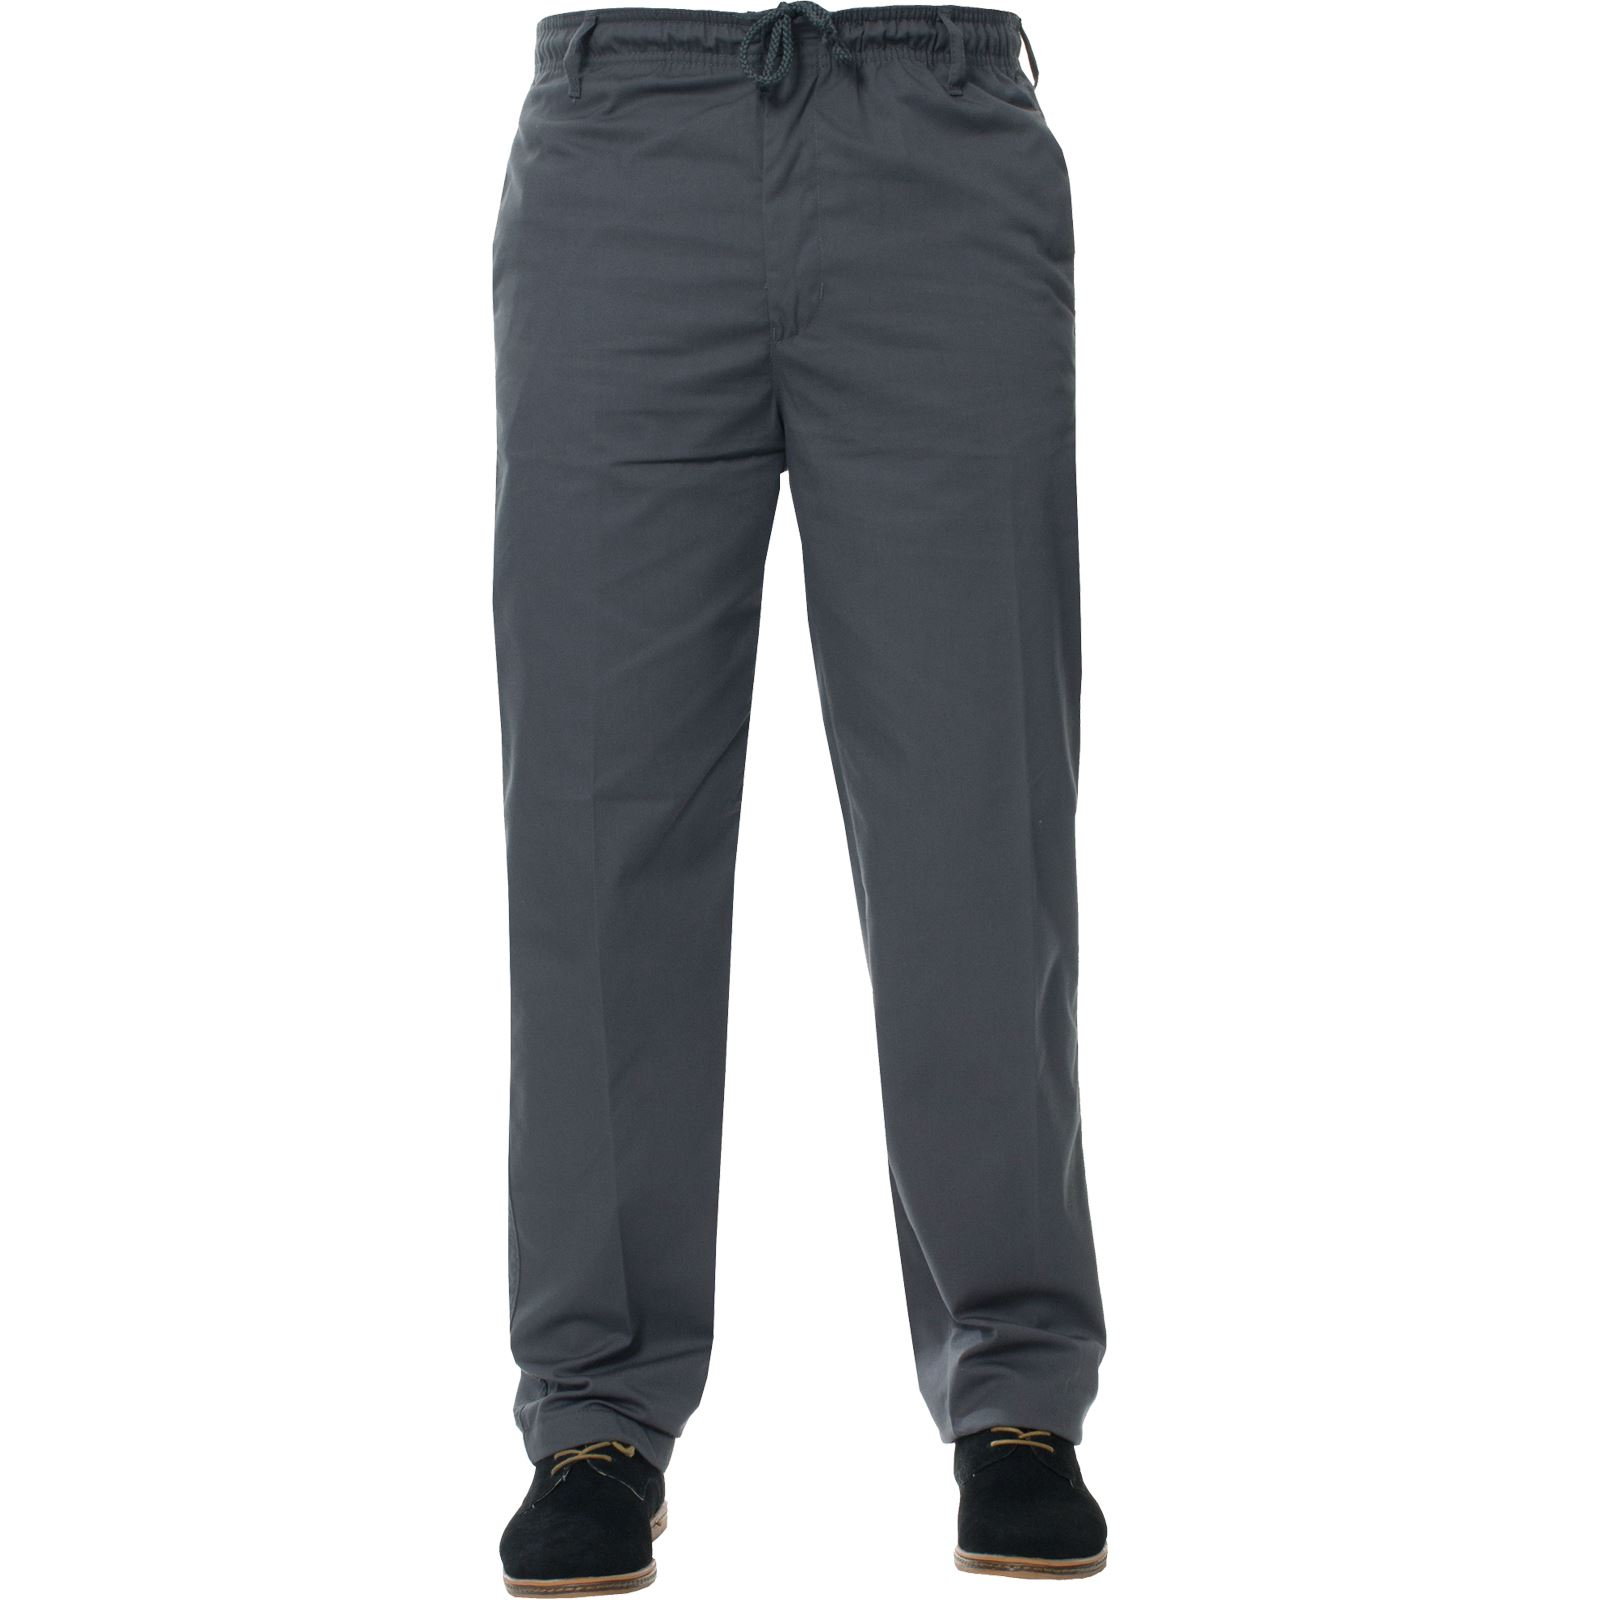 Para-Hombres-Pantalones-De-Rugby-Kruze-cintura-elastica-con-cordon-pantalones-REGULAR-King-Tamanos miniatura 24